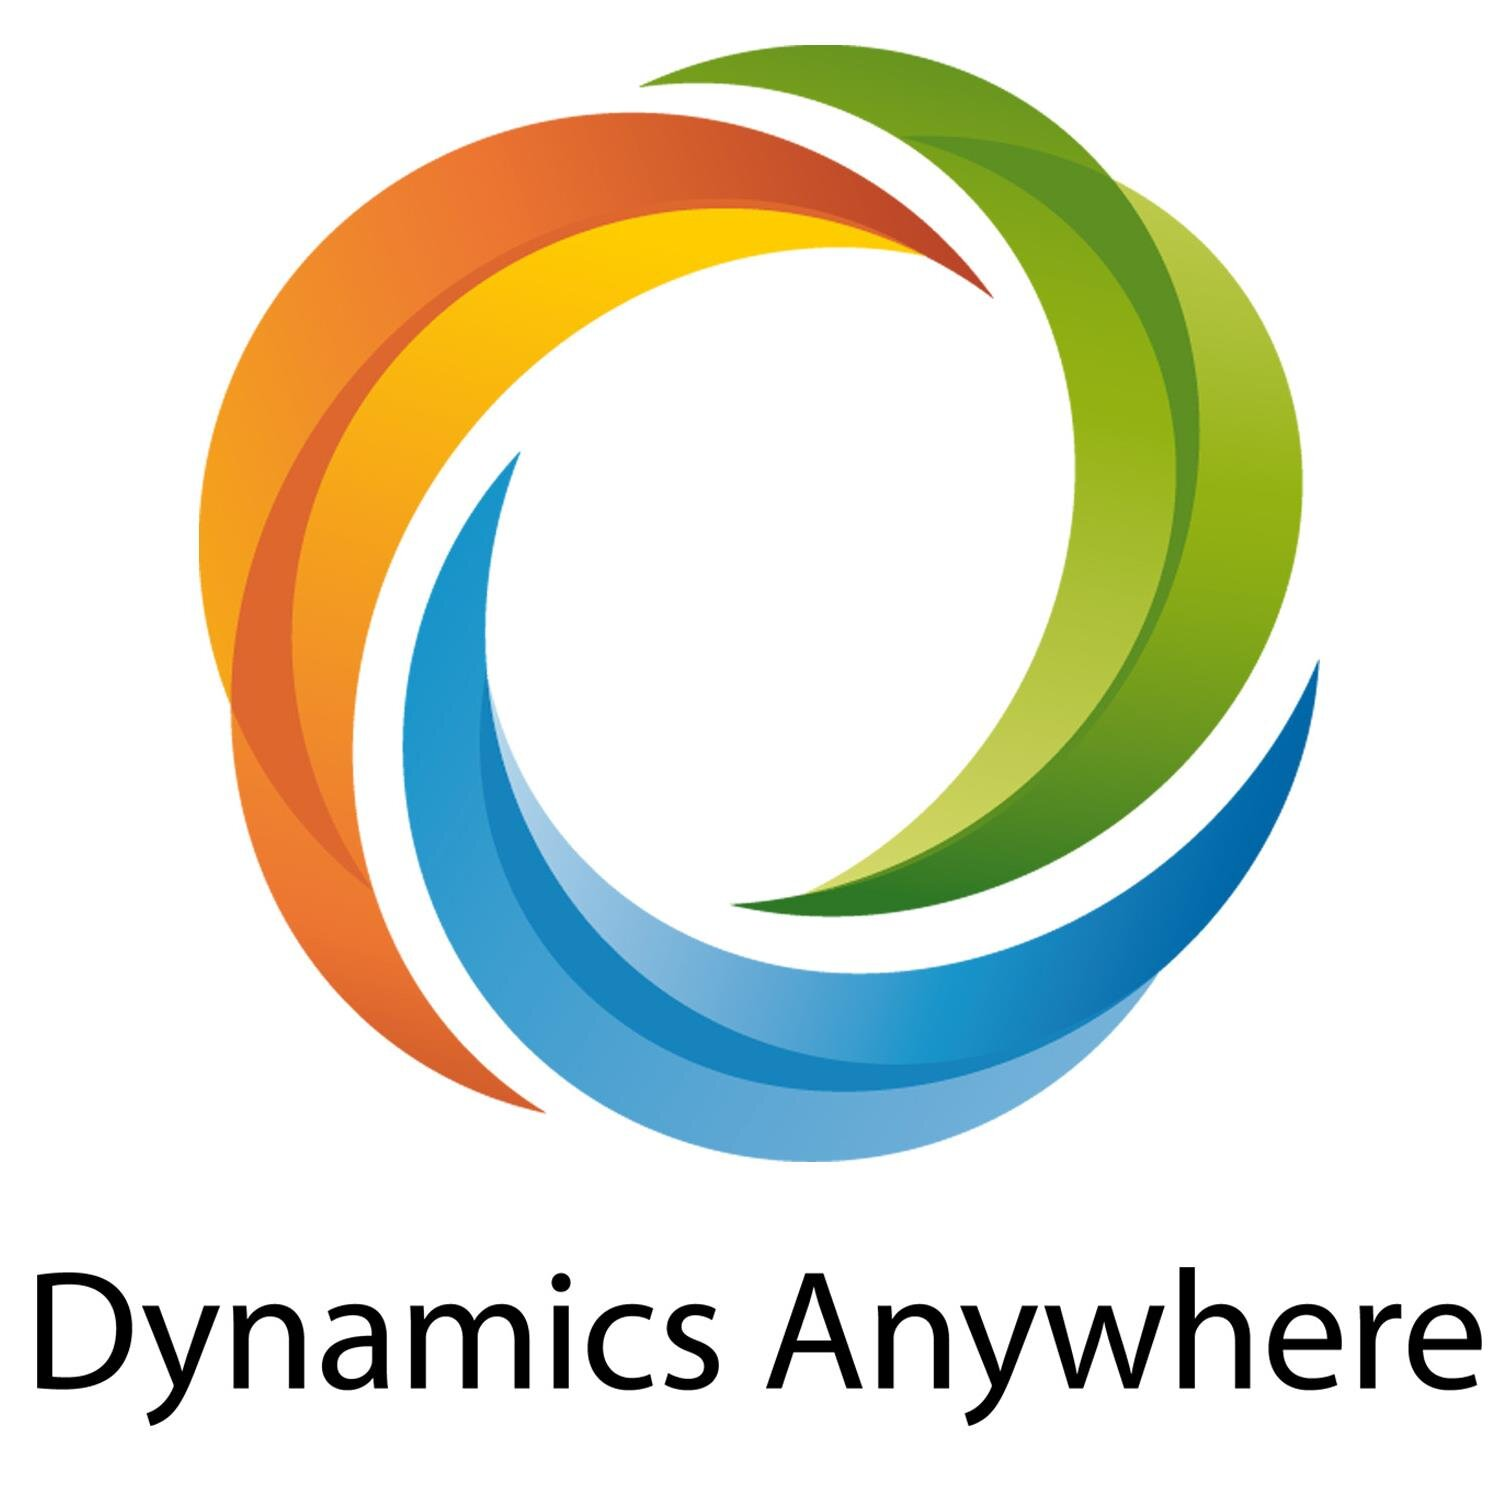 Dynamics Anywhere